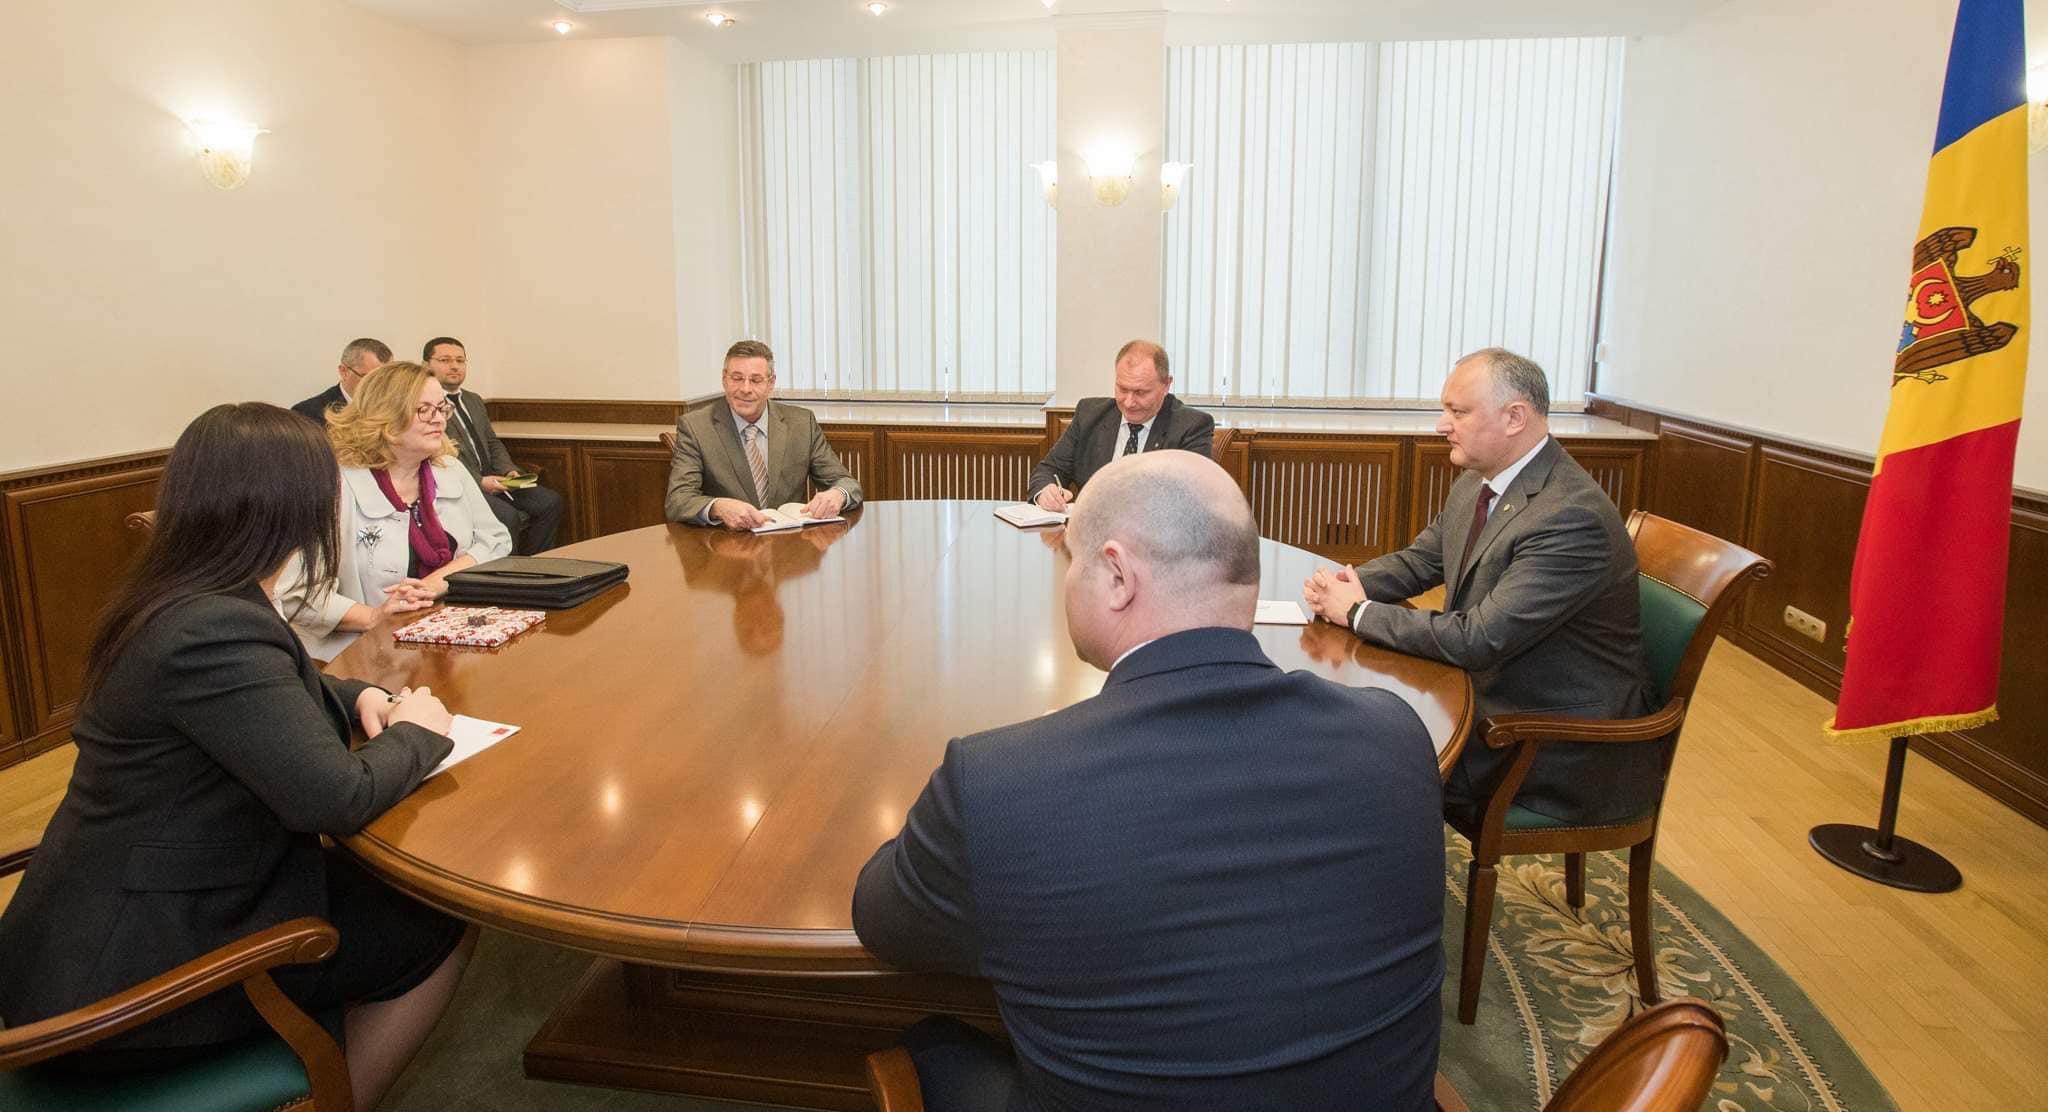 Додон провел встречу с послом Австрии в Молдове (ФОТО, ВИДЕО)